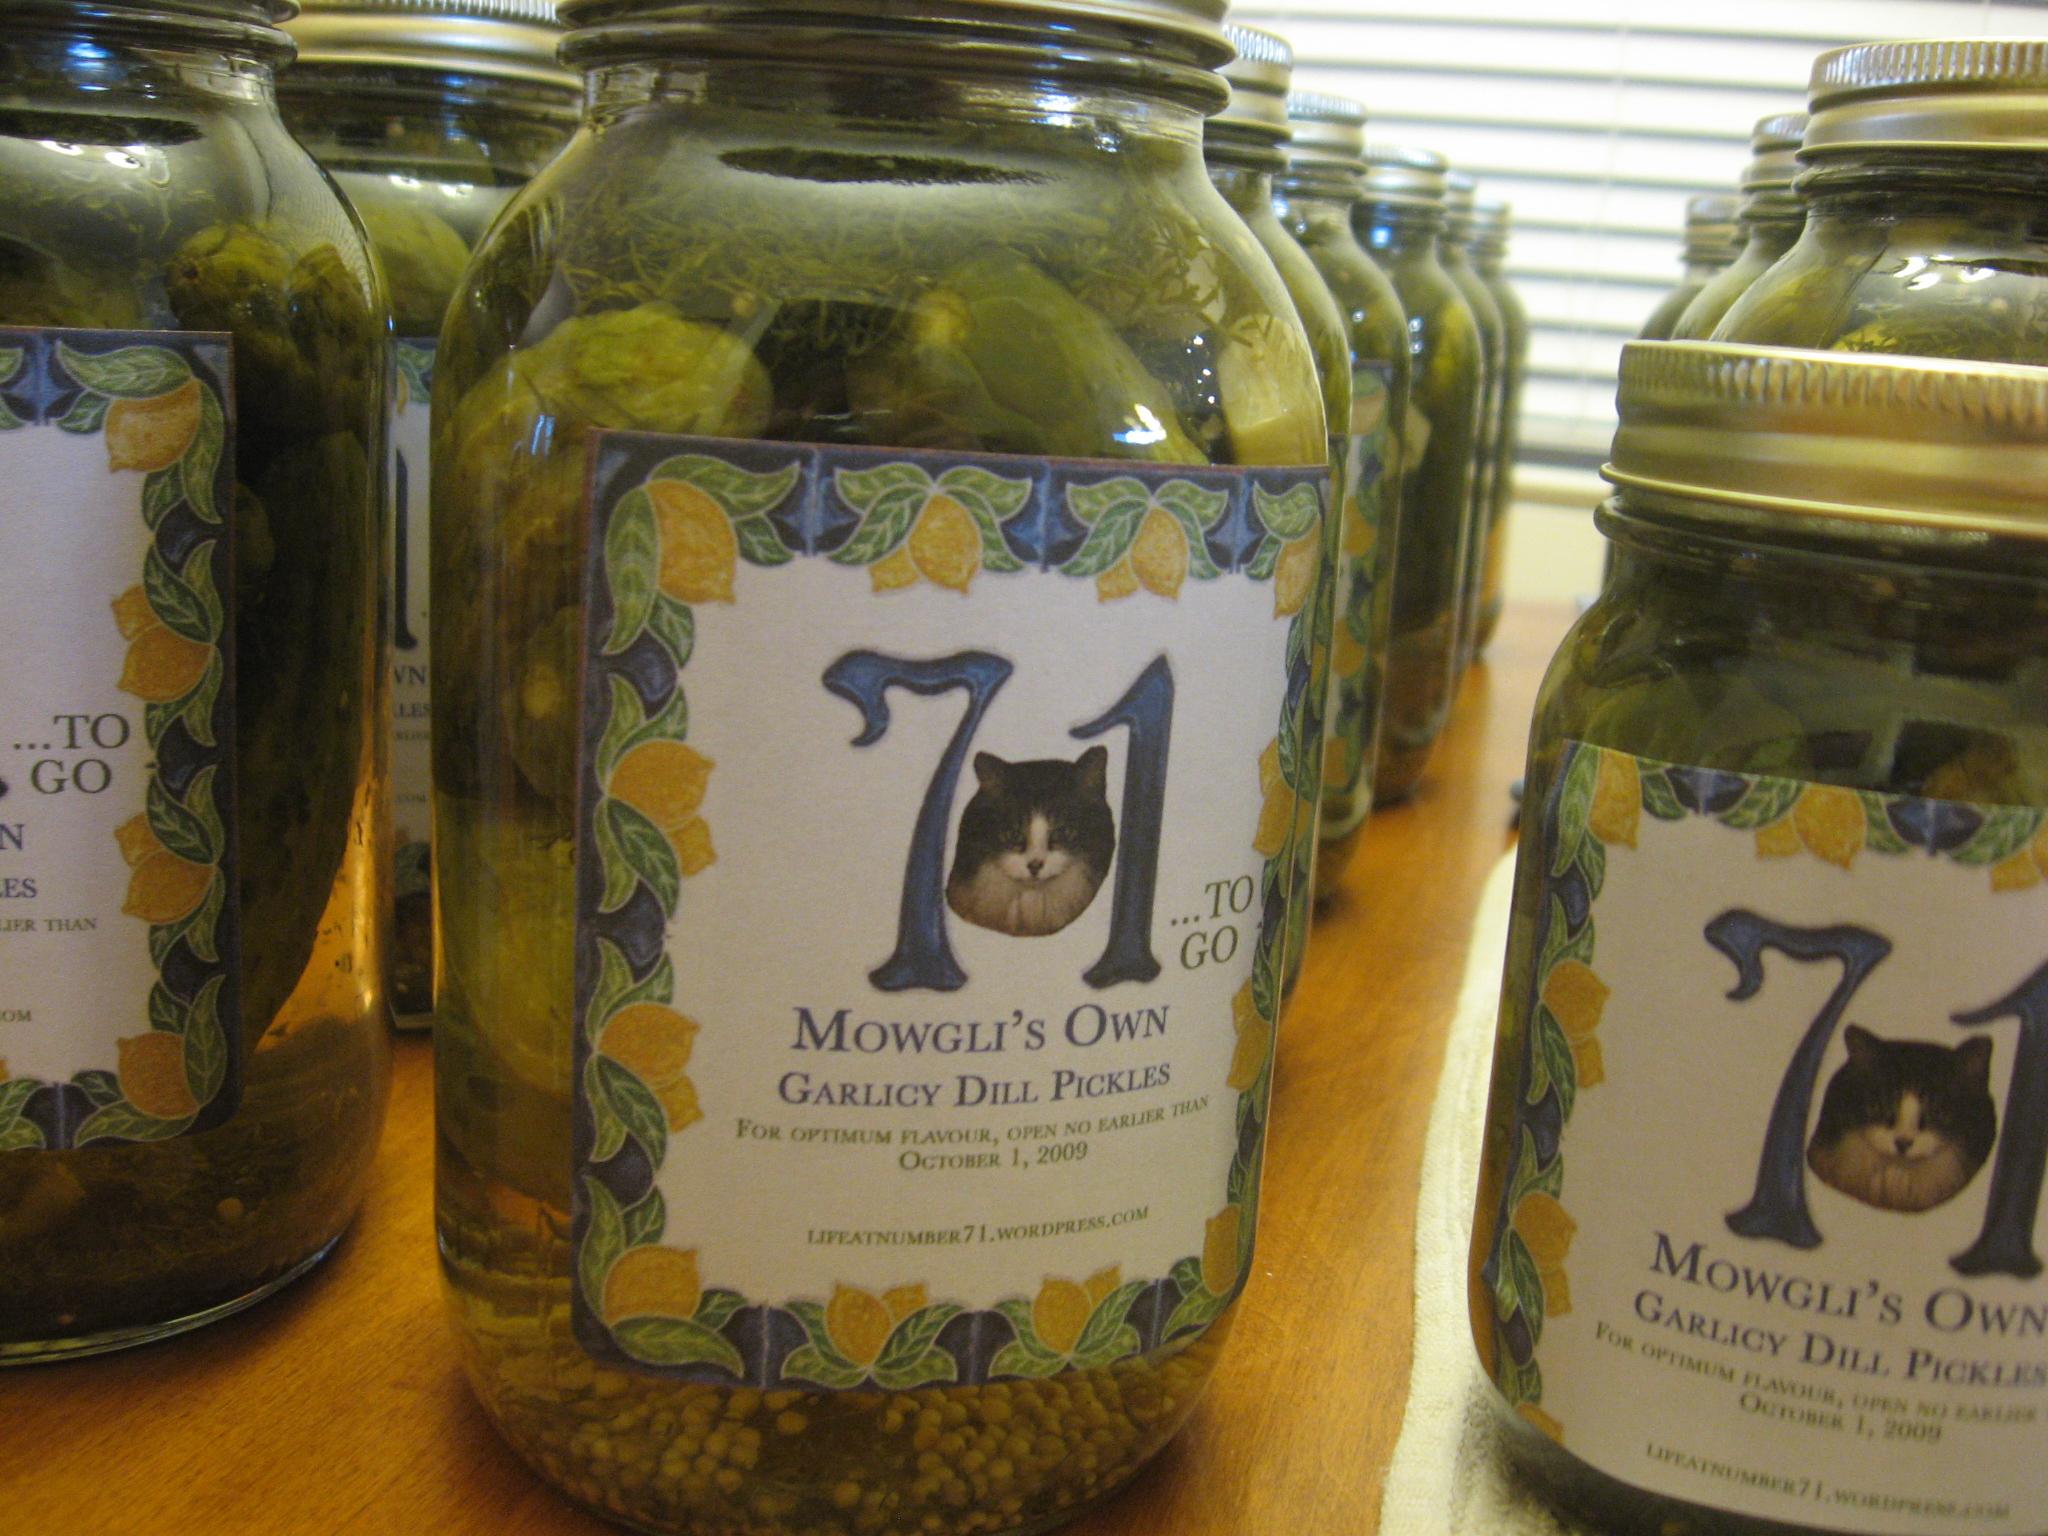 Mowgli's Own Garlicy Dill Pickles